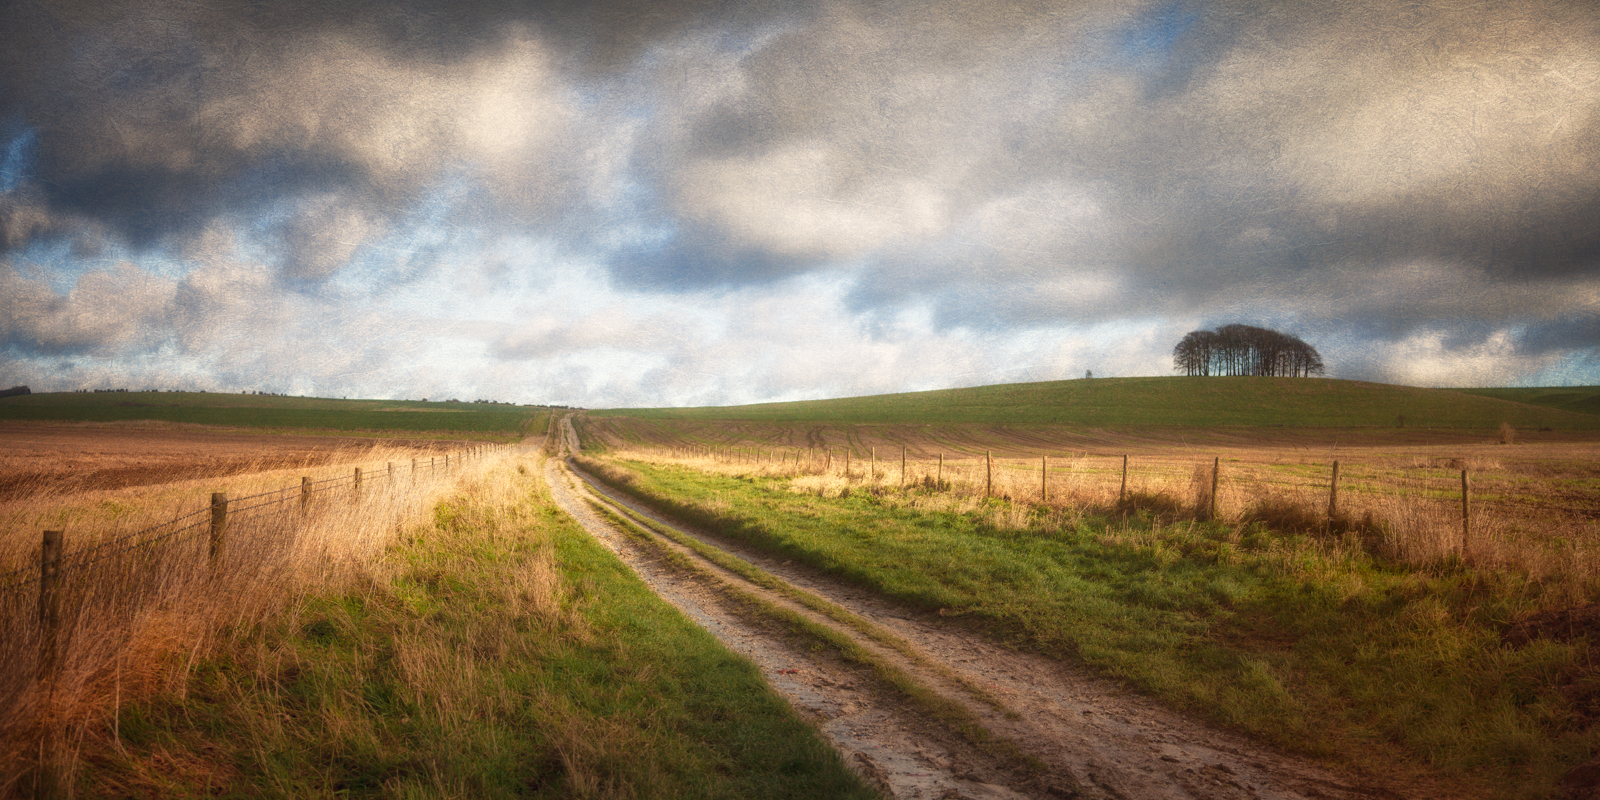 The old track from Marlborough to Bath, near Avebury